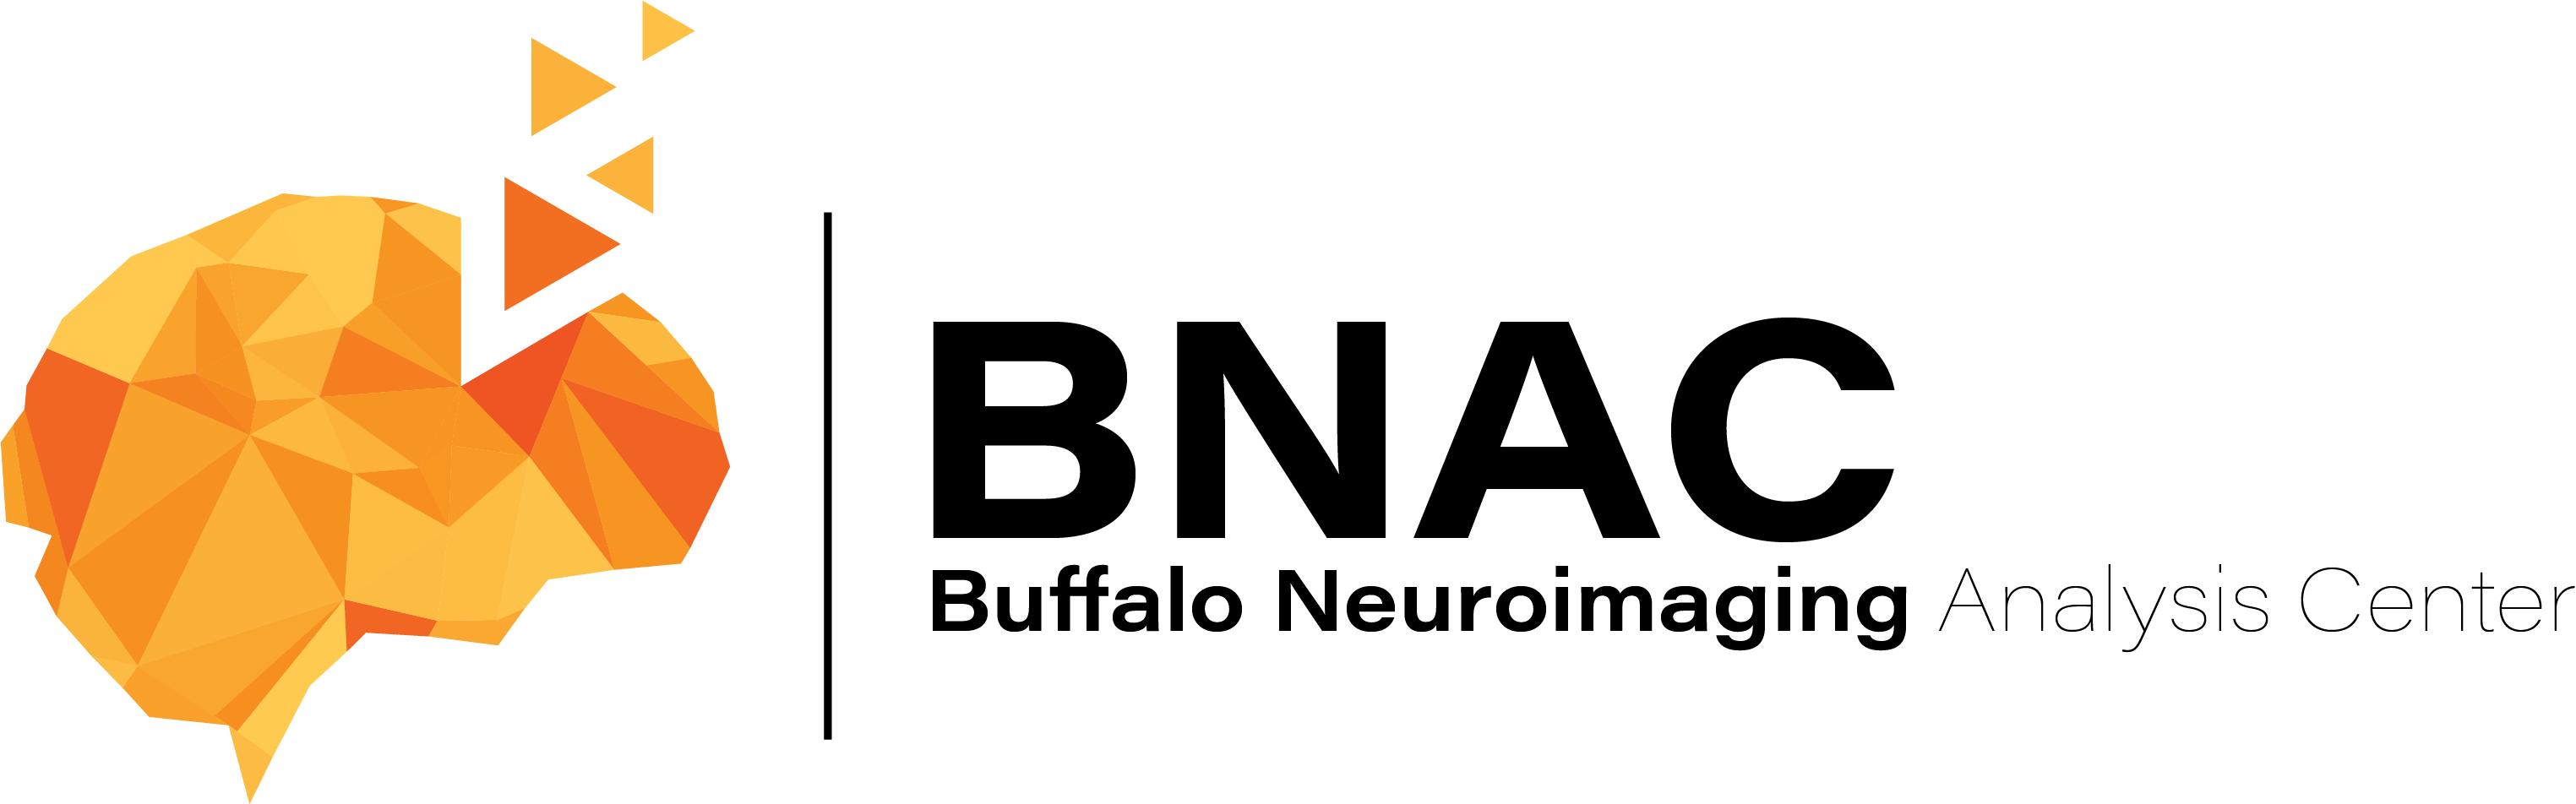 The Buffalo Neuroimaging Analysis Center logo